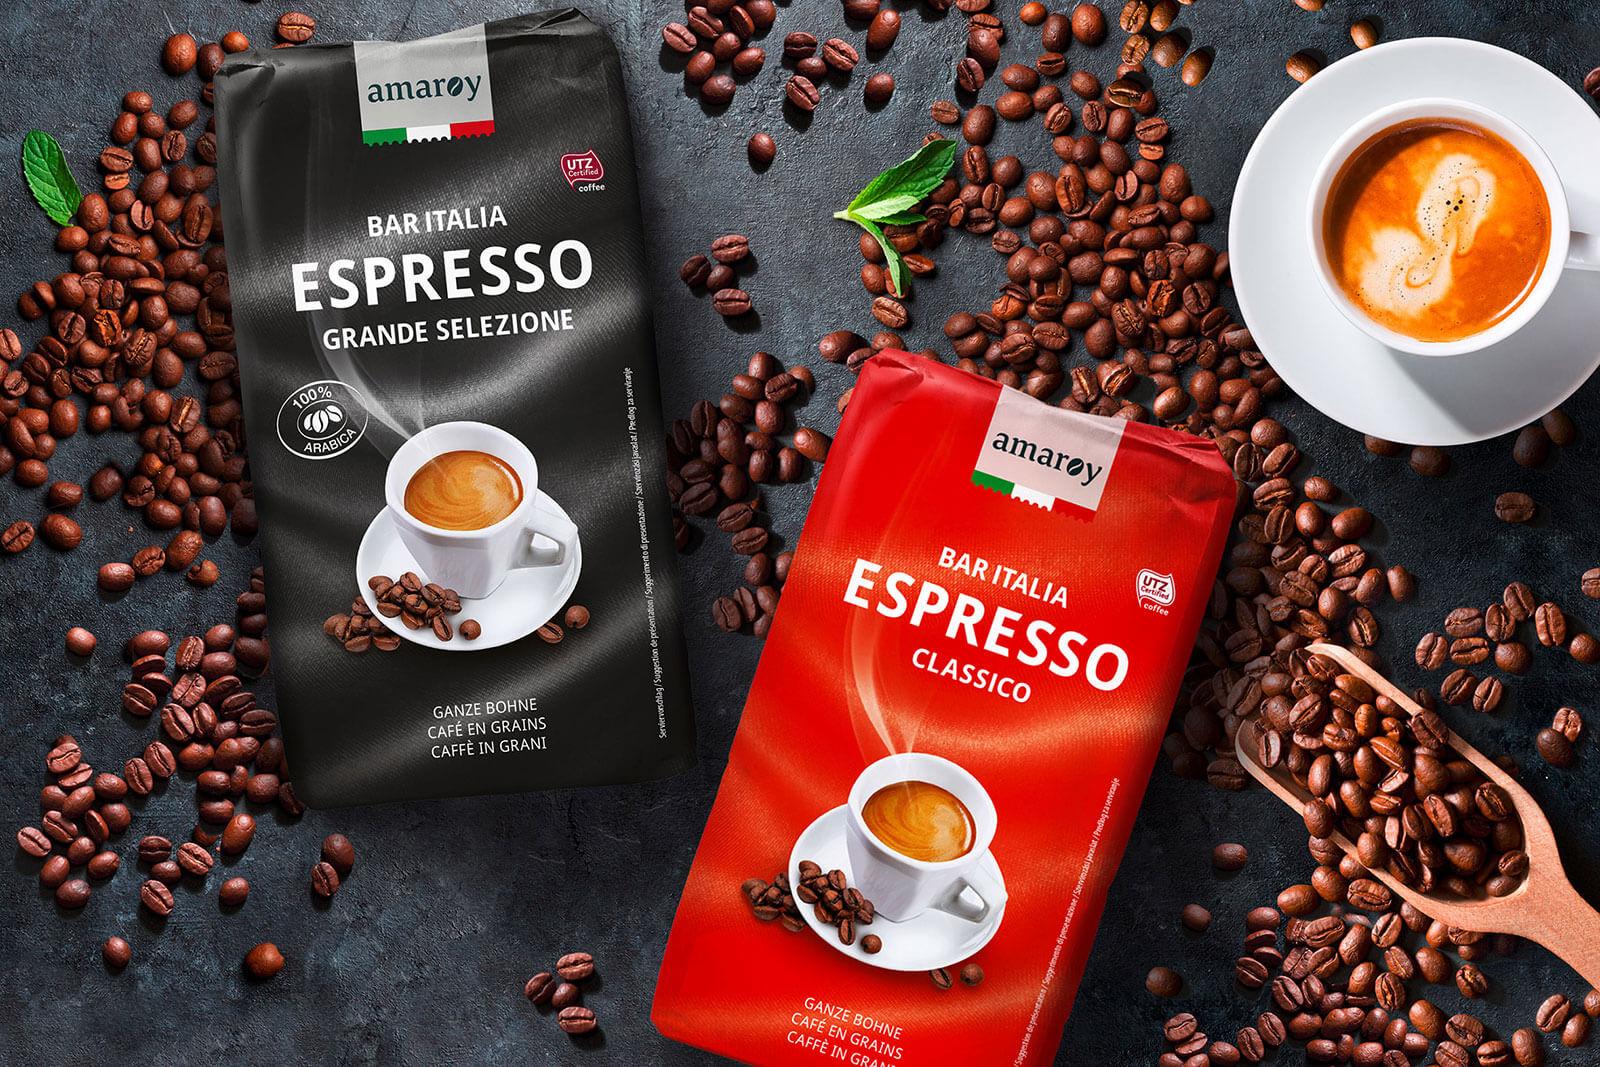 hofer amaroy kaffee bar italia espresso classico und grande selezione imagebild design packaging rubicon